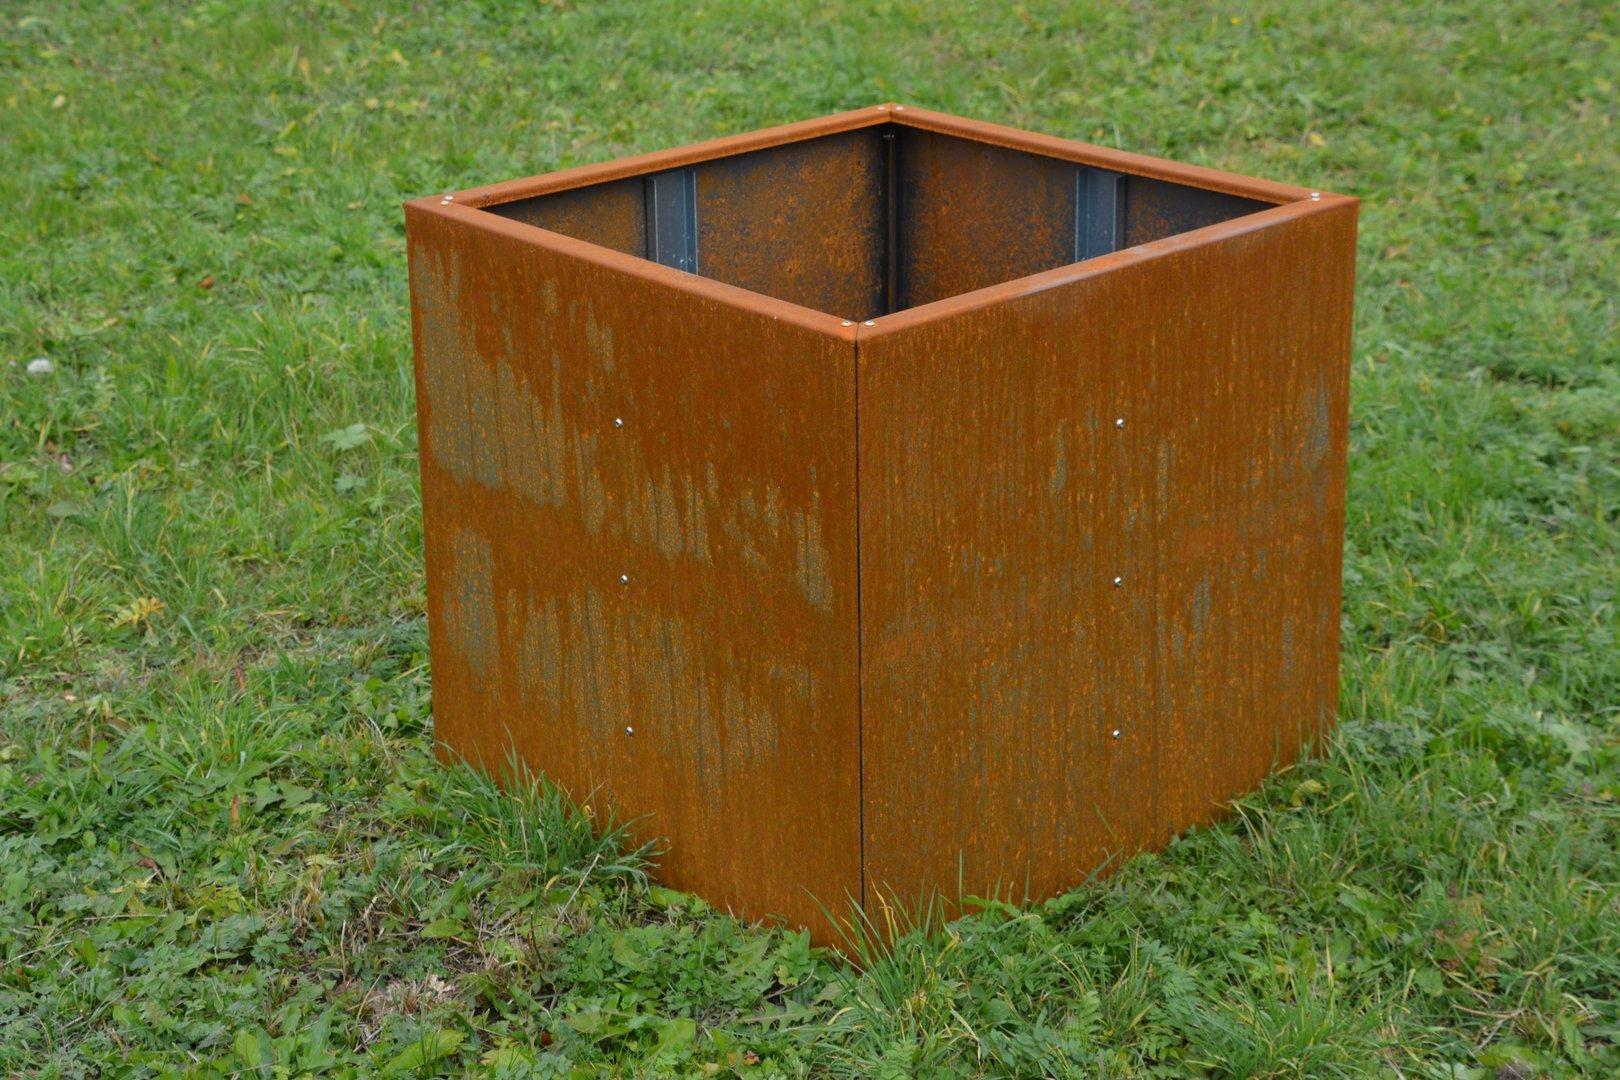 Hochbeet Urban Metall 1 5 M X 1 5 M Hohe 0 7 M Edelrost